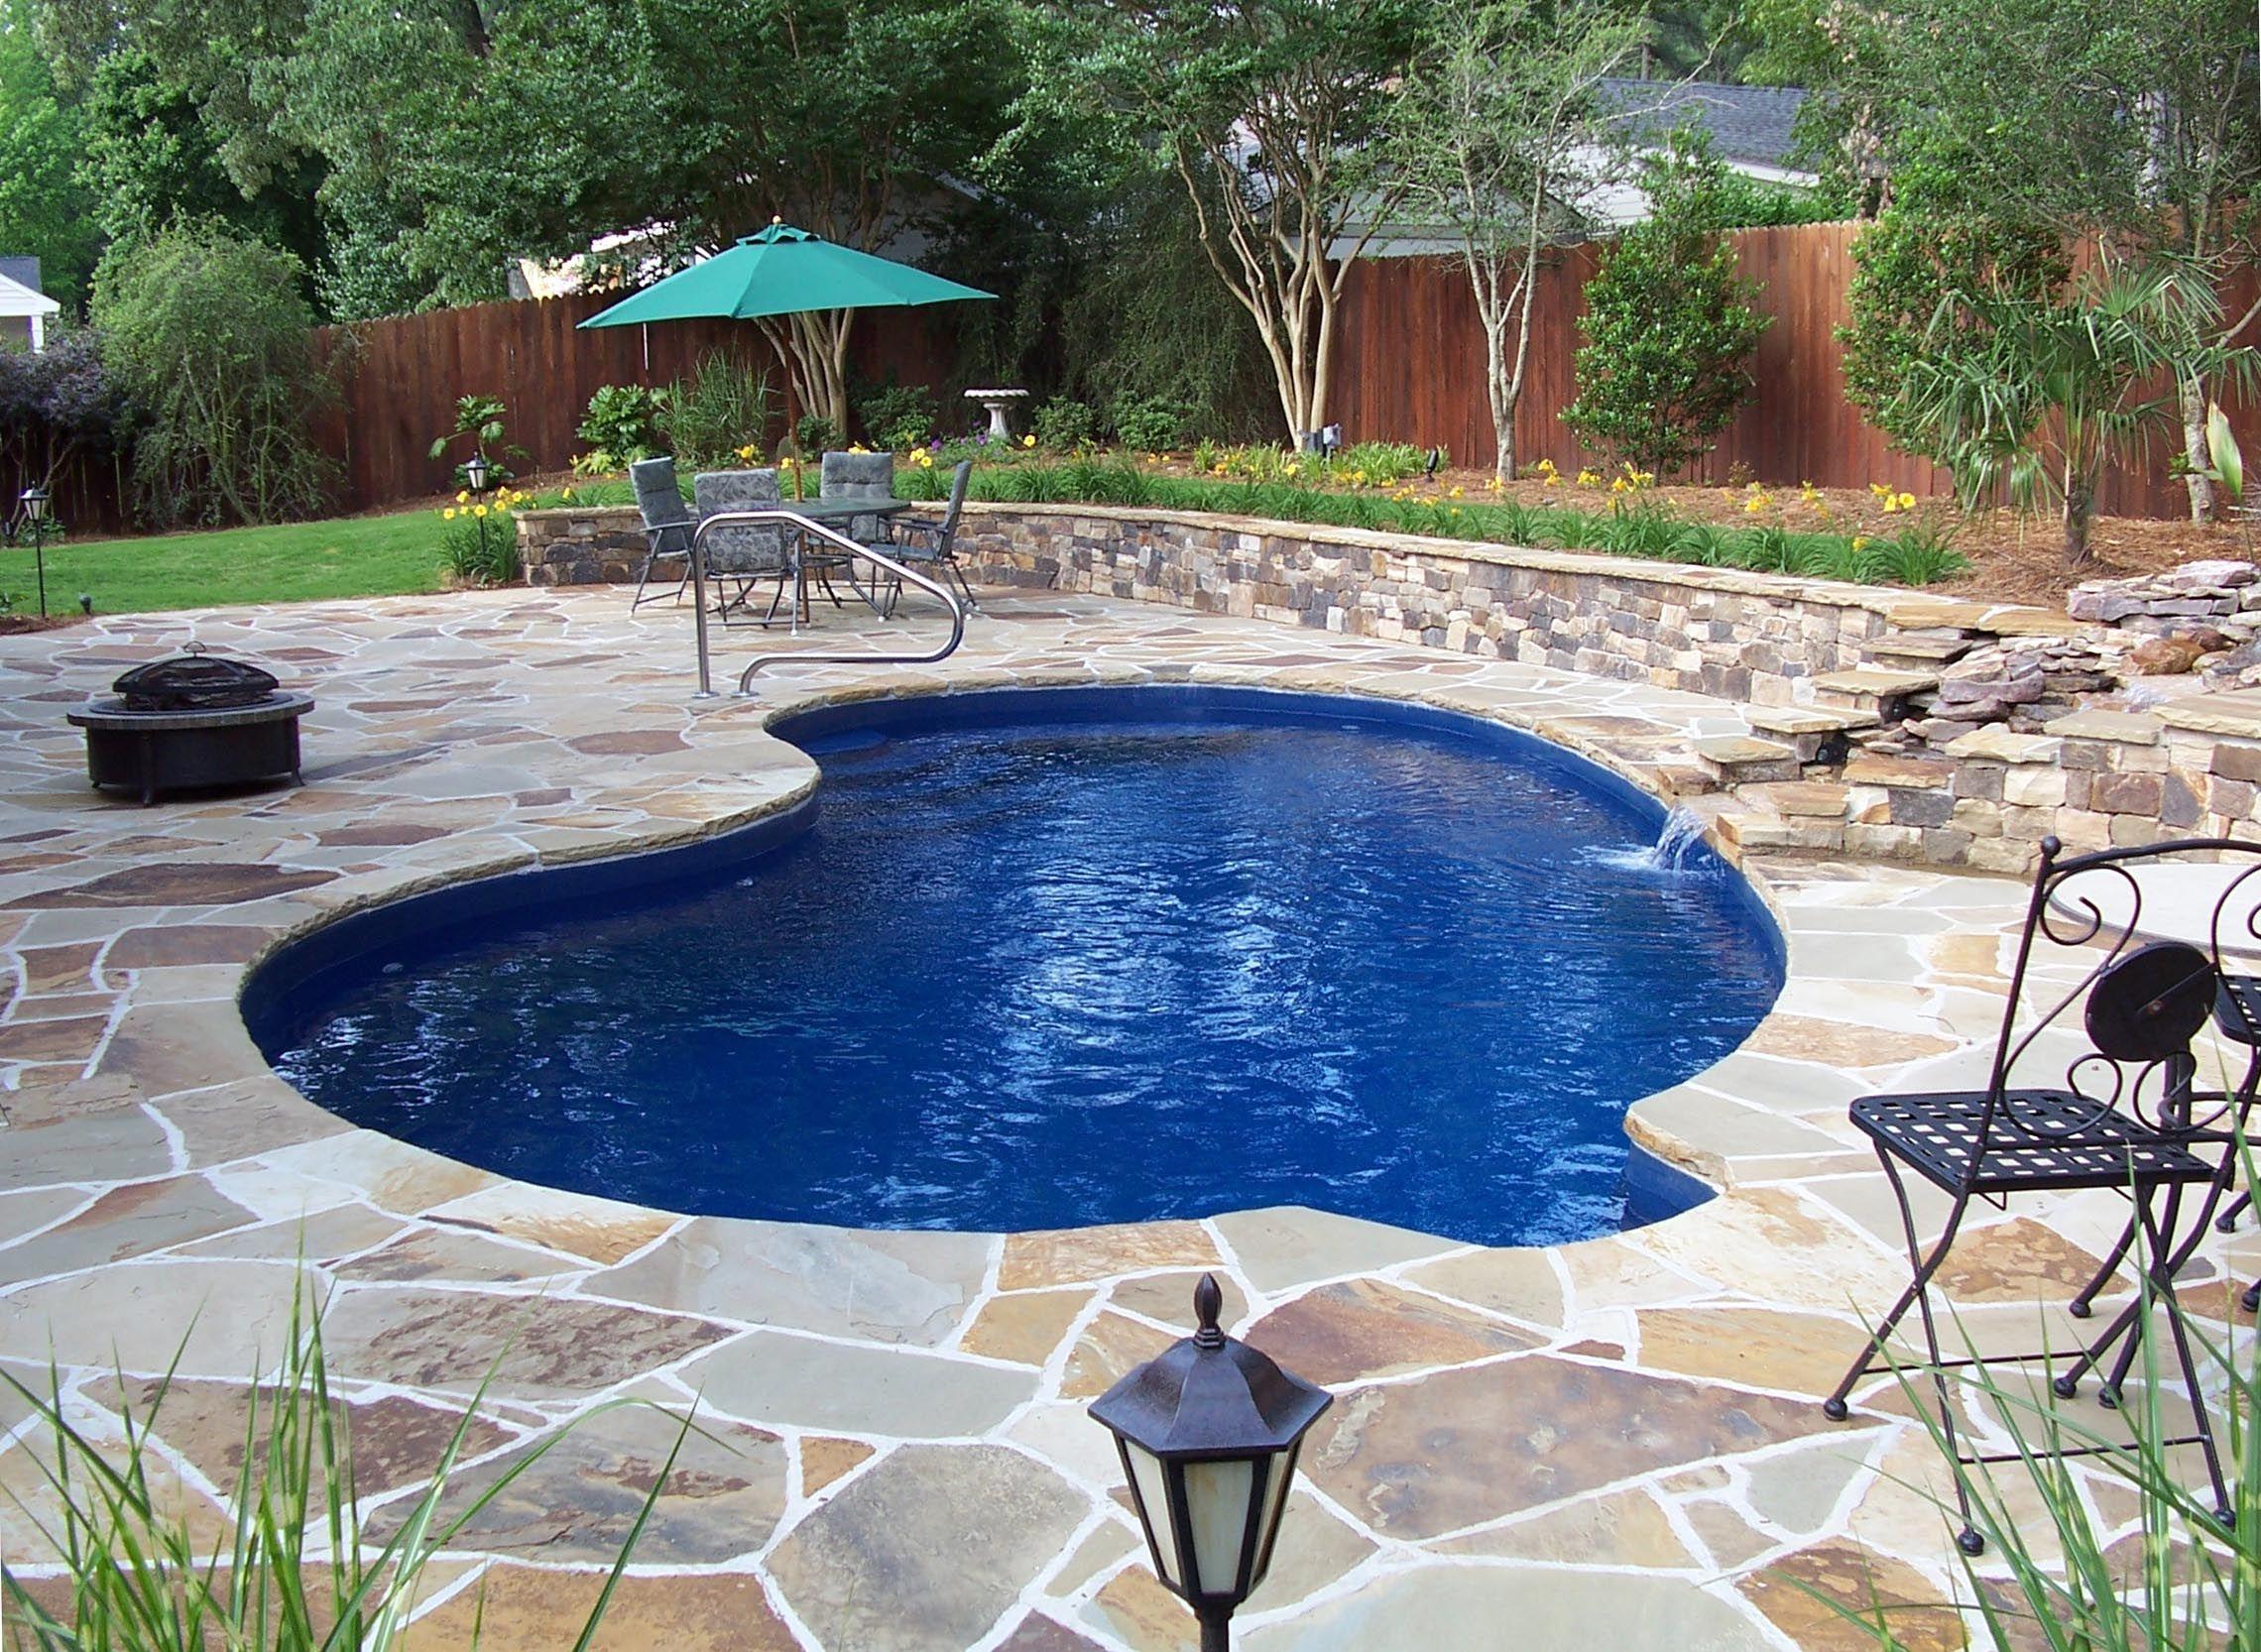 Fiberglass Inground Fiberglass Pools Fiberglass Swimming Pools Swimming Pool Prices